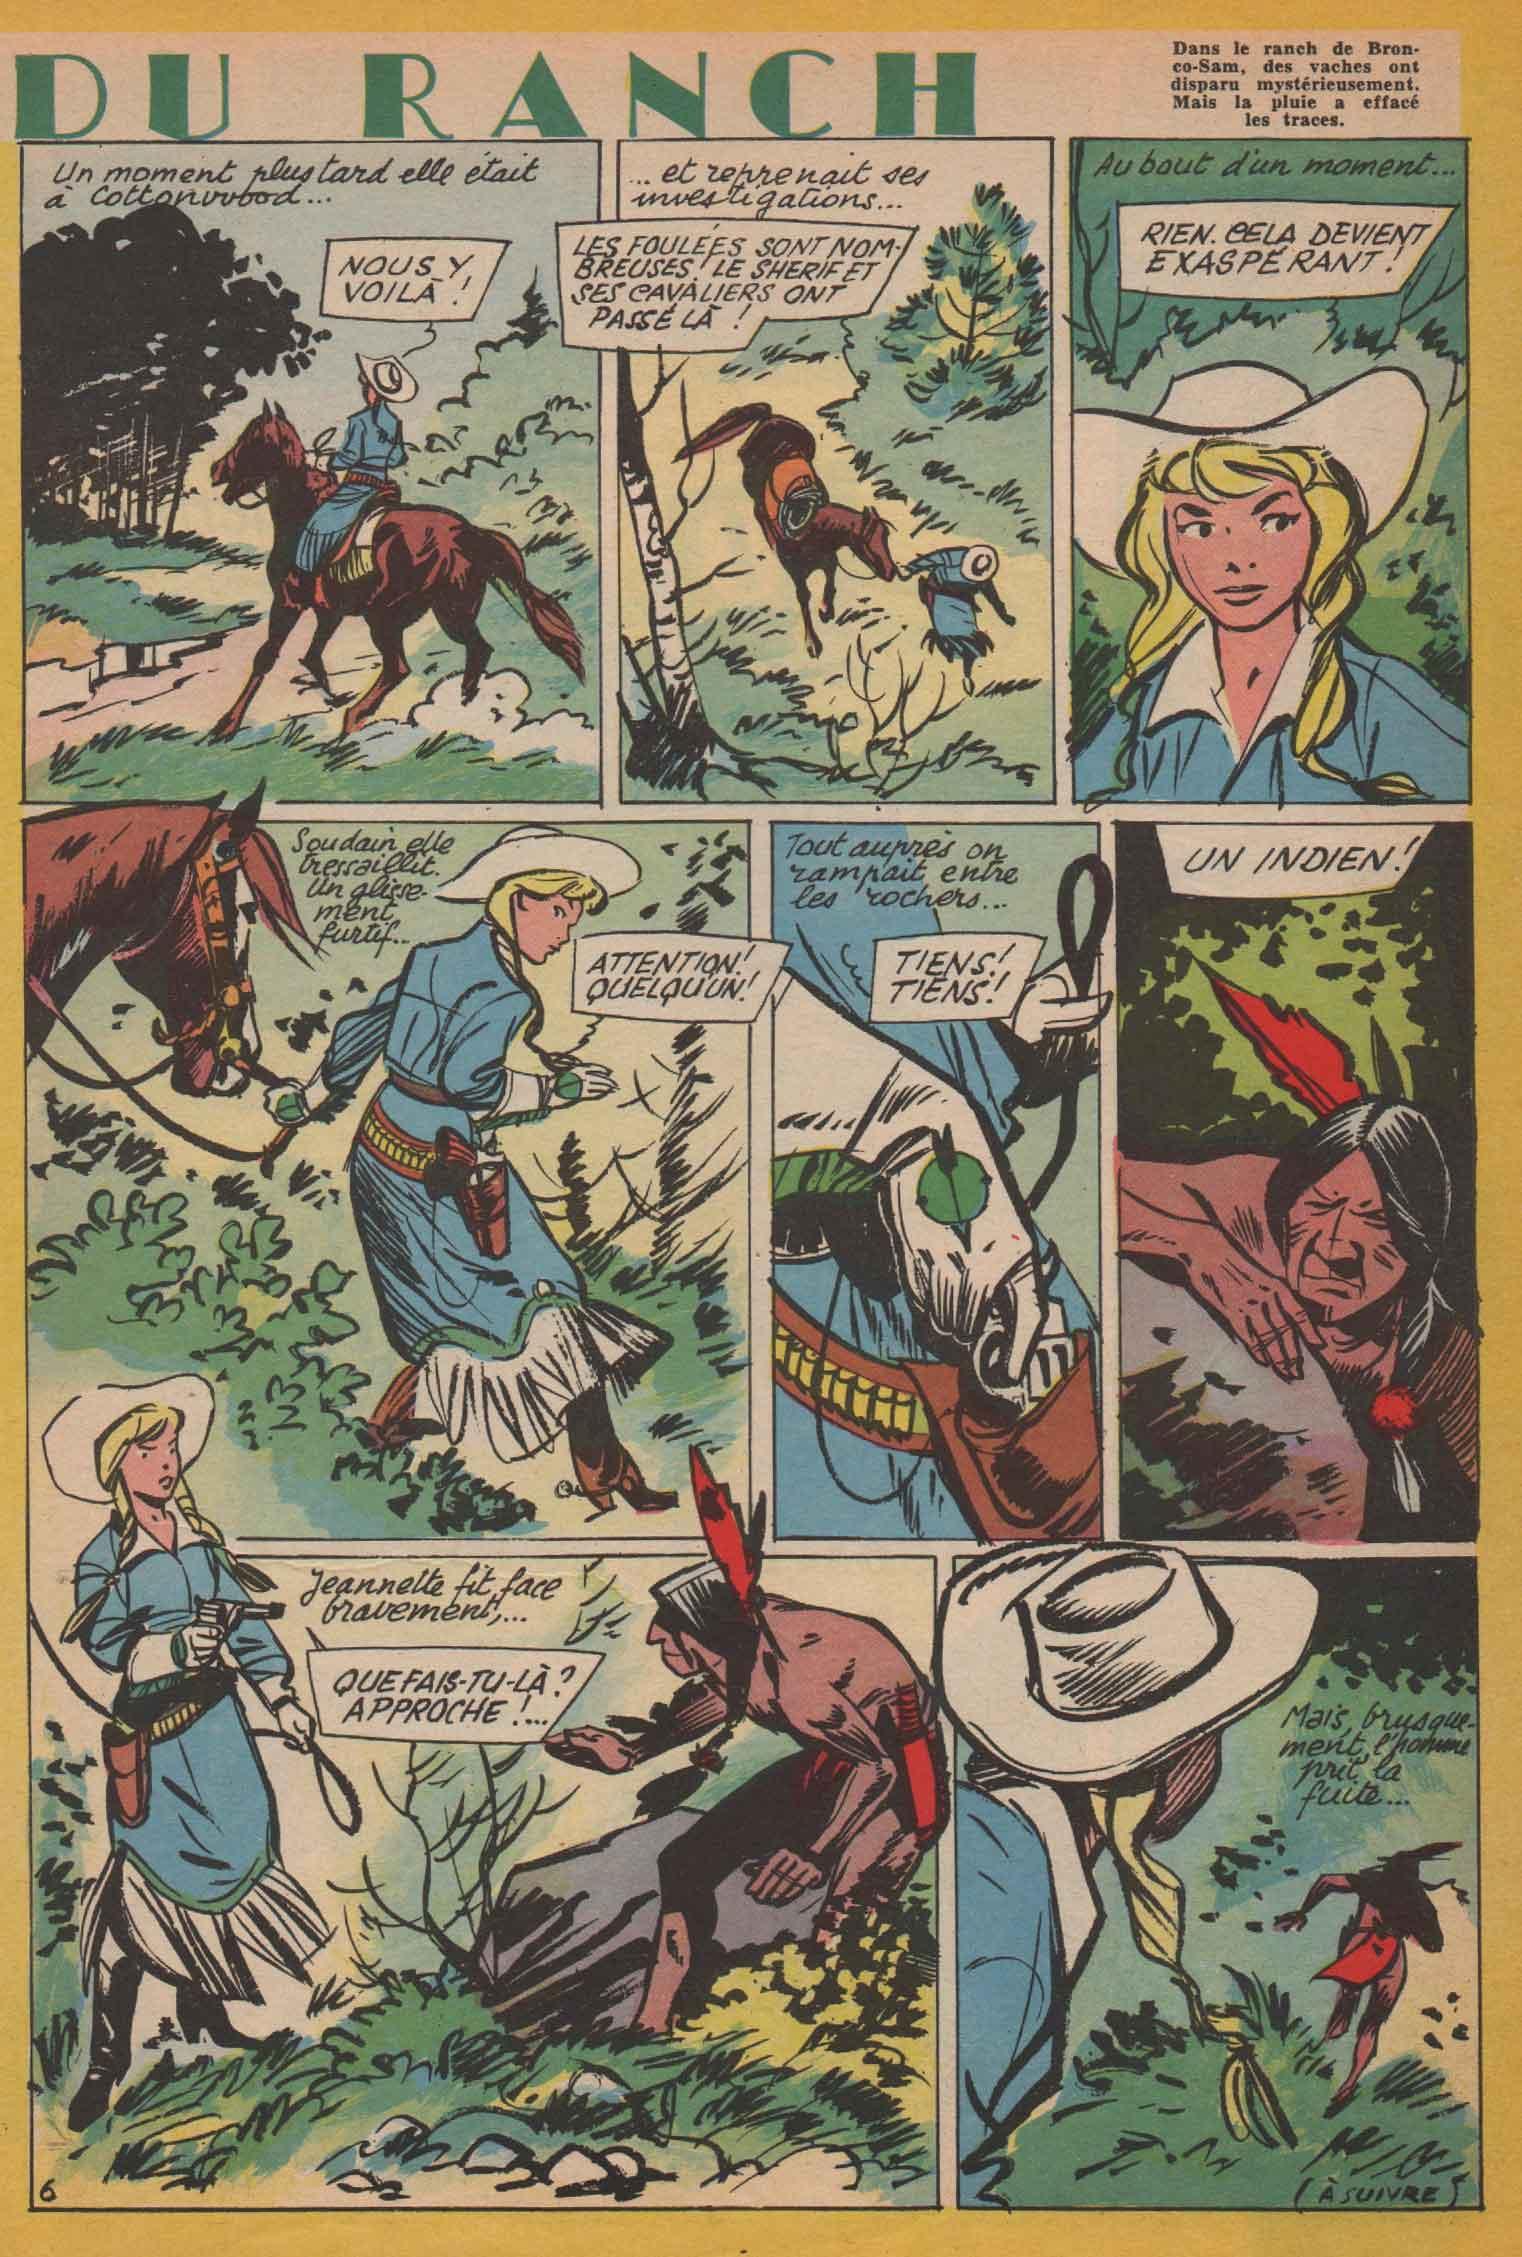 « La Fille du ranch » Bernadette 146 (12/04/1959).